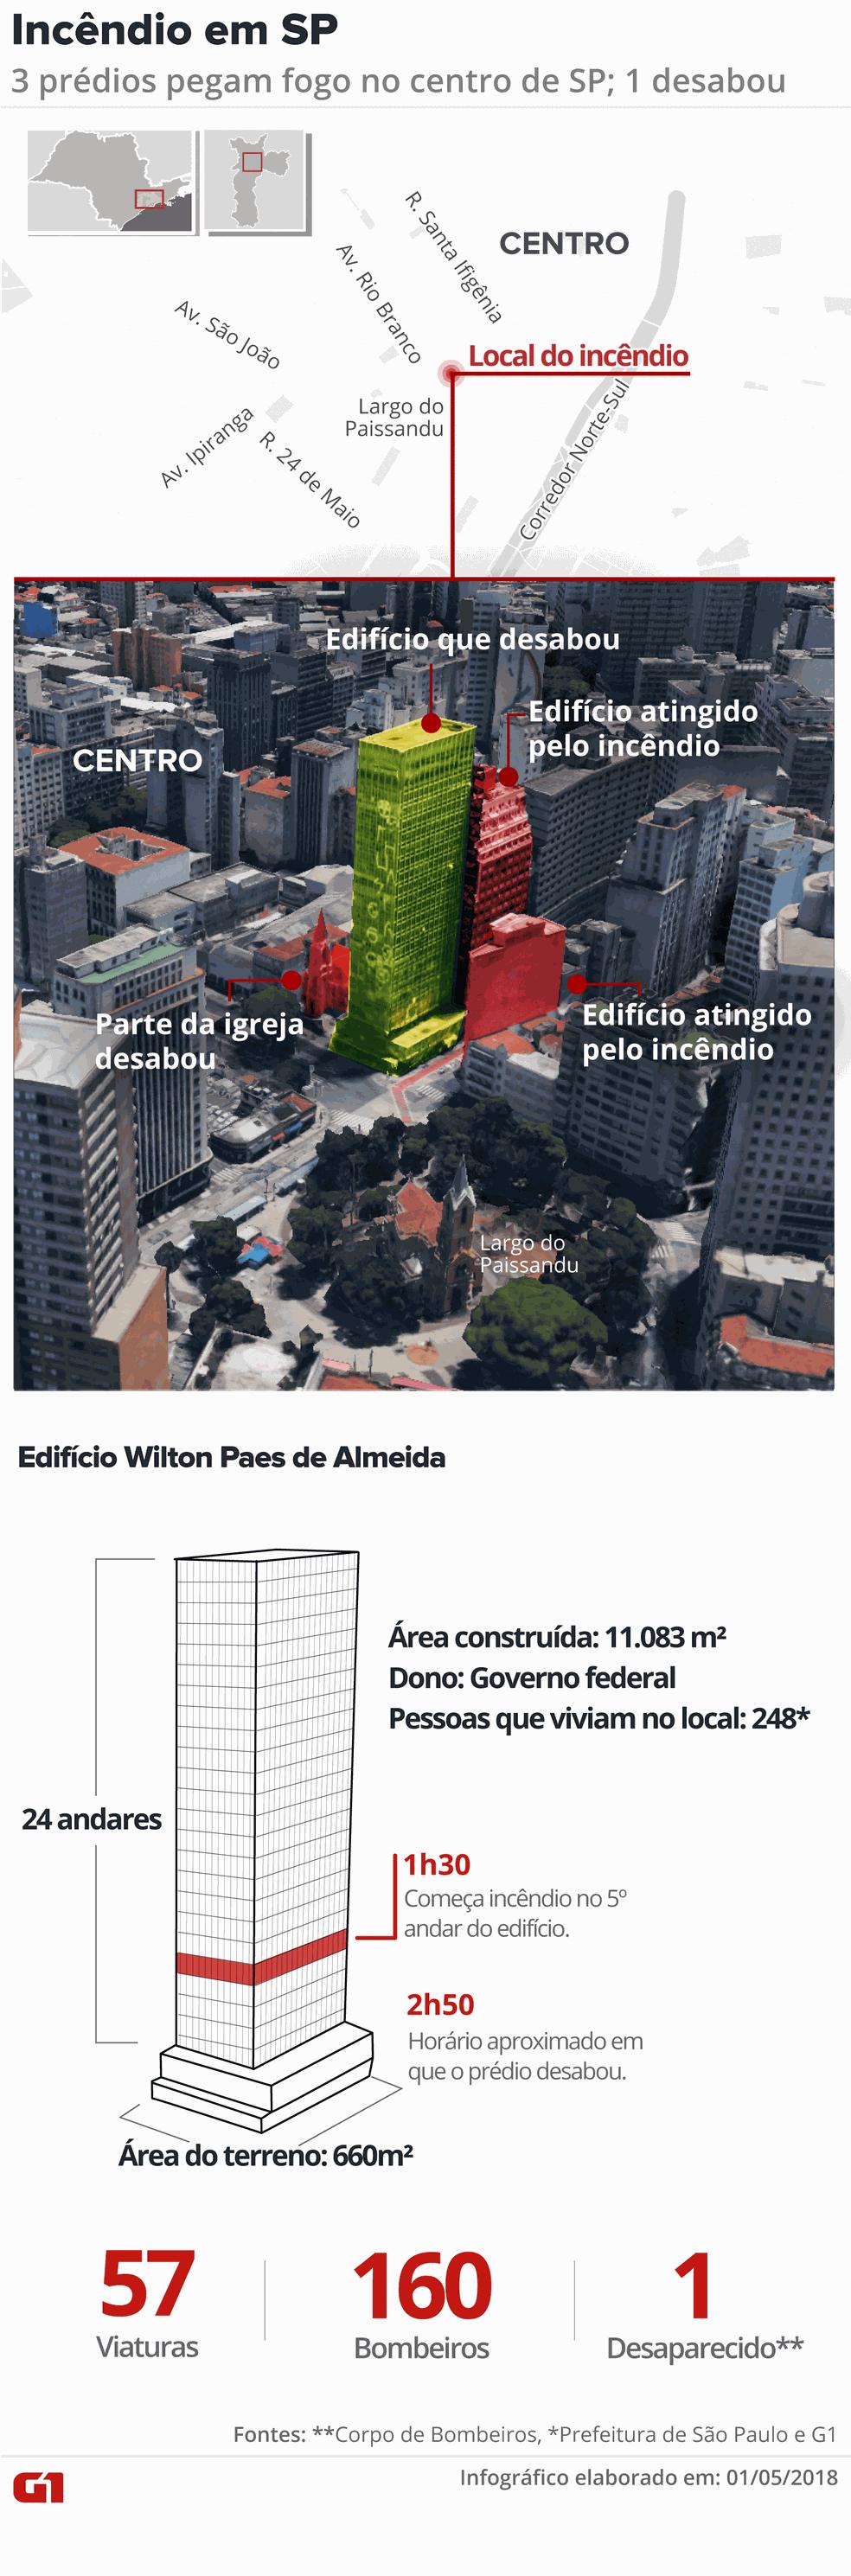 Infogr&aacutefico